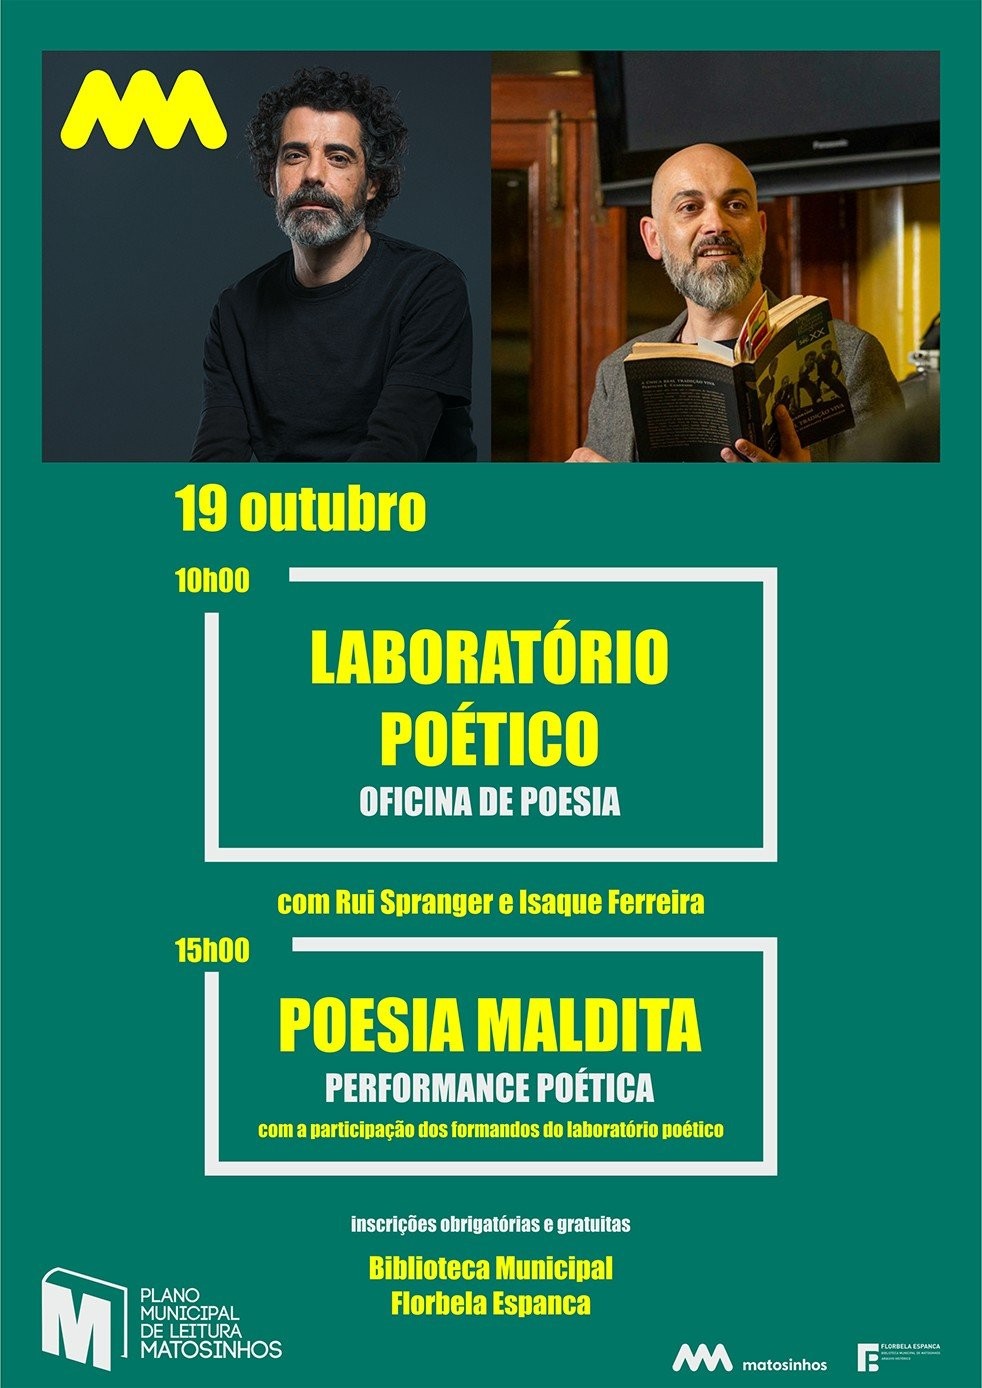 Rui Spranger e Isaque Ferreira